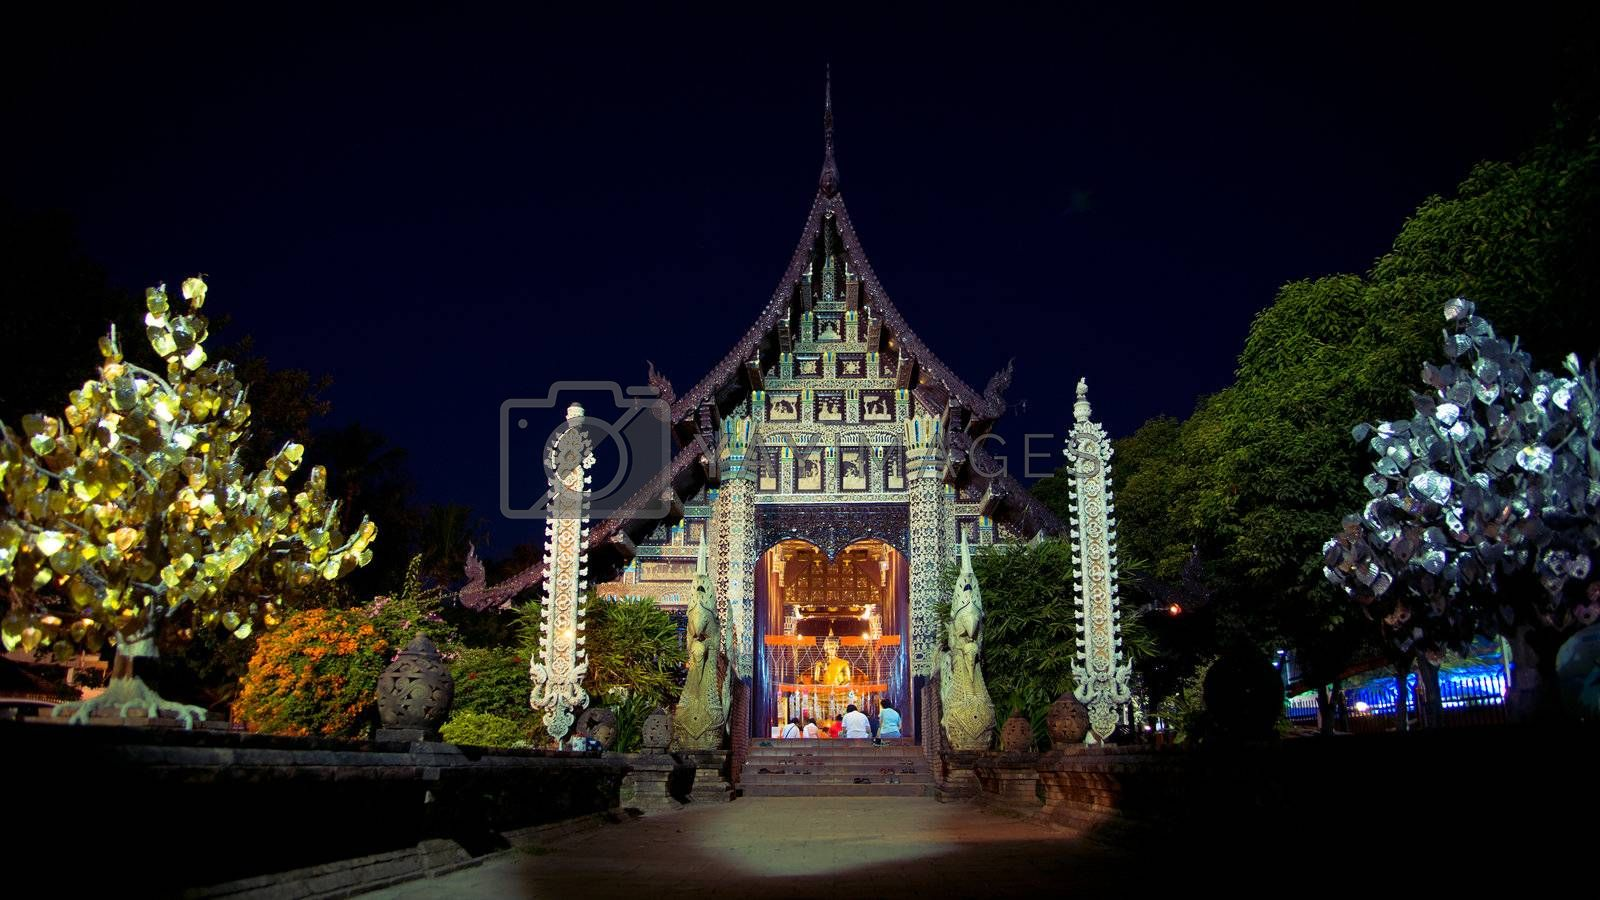 Night prayer at Lok Molee temple in Chiangmai, Thailand